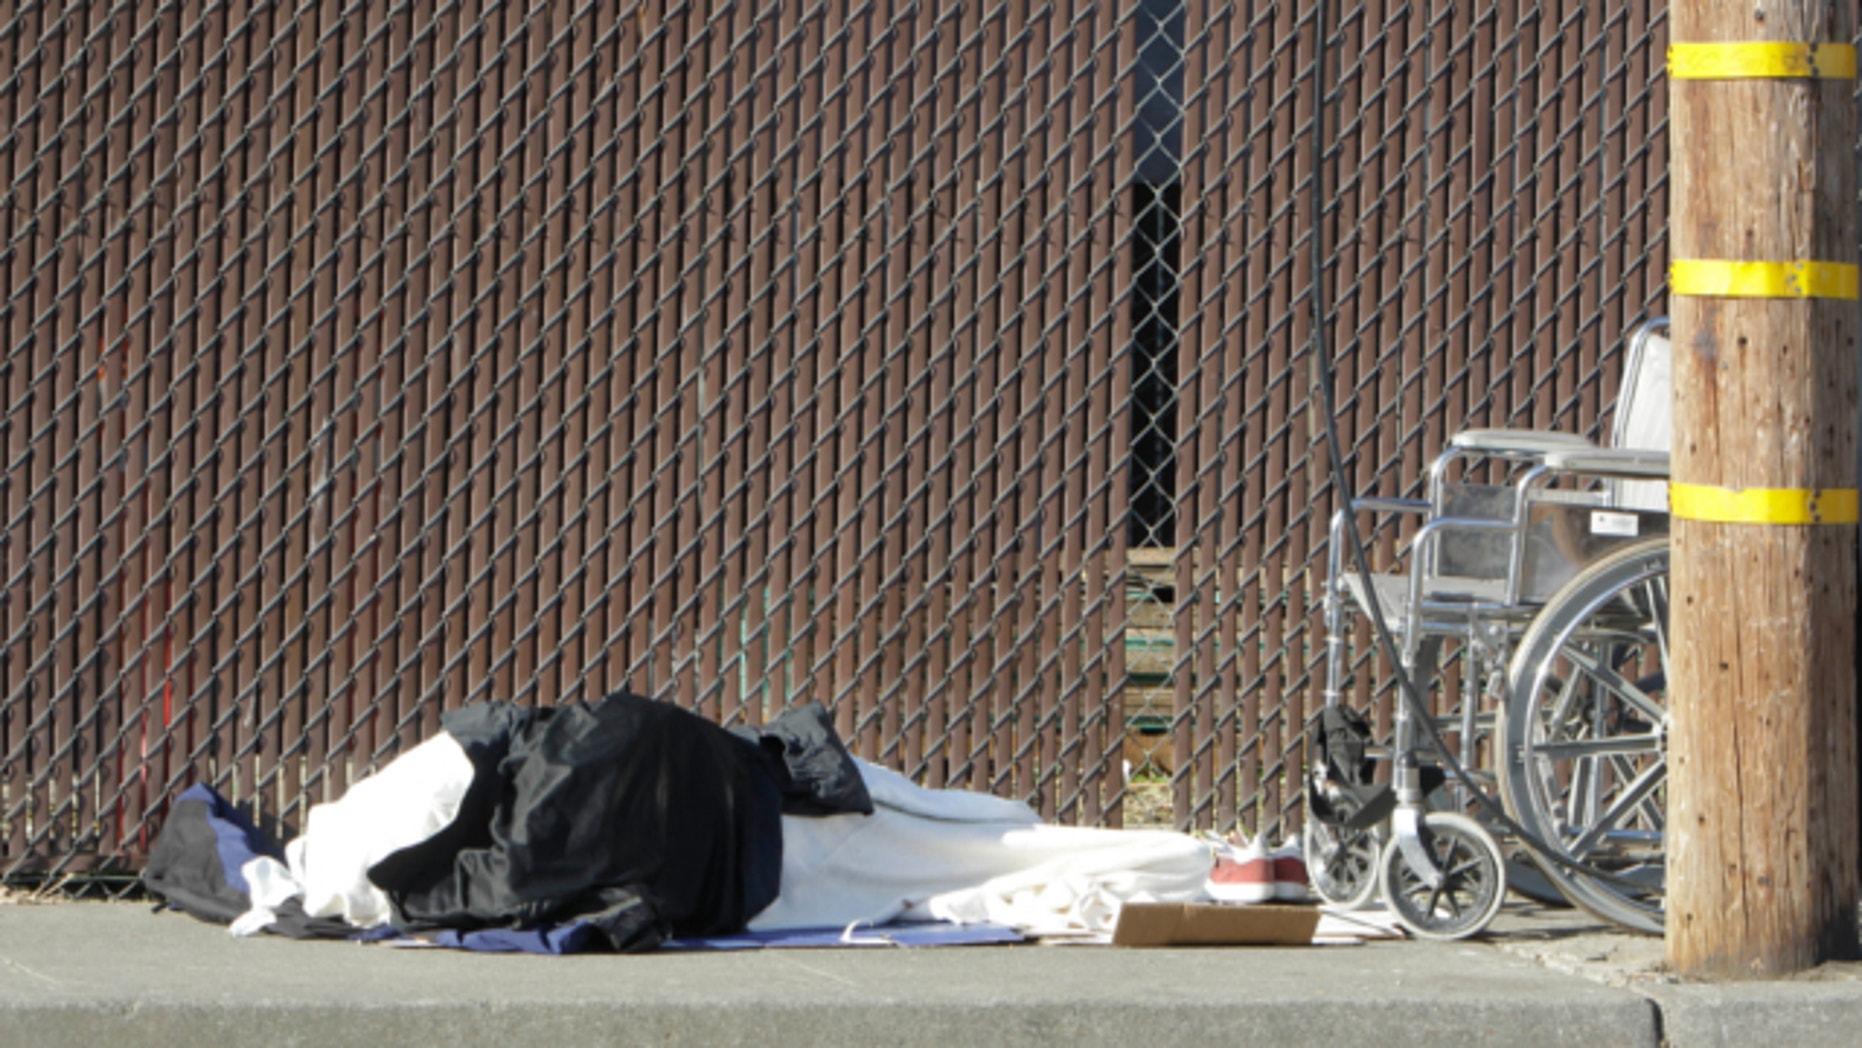 April 23, 2013: A homeless person sleeps on a sidewalk in Sacramento, Calif.